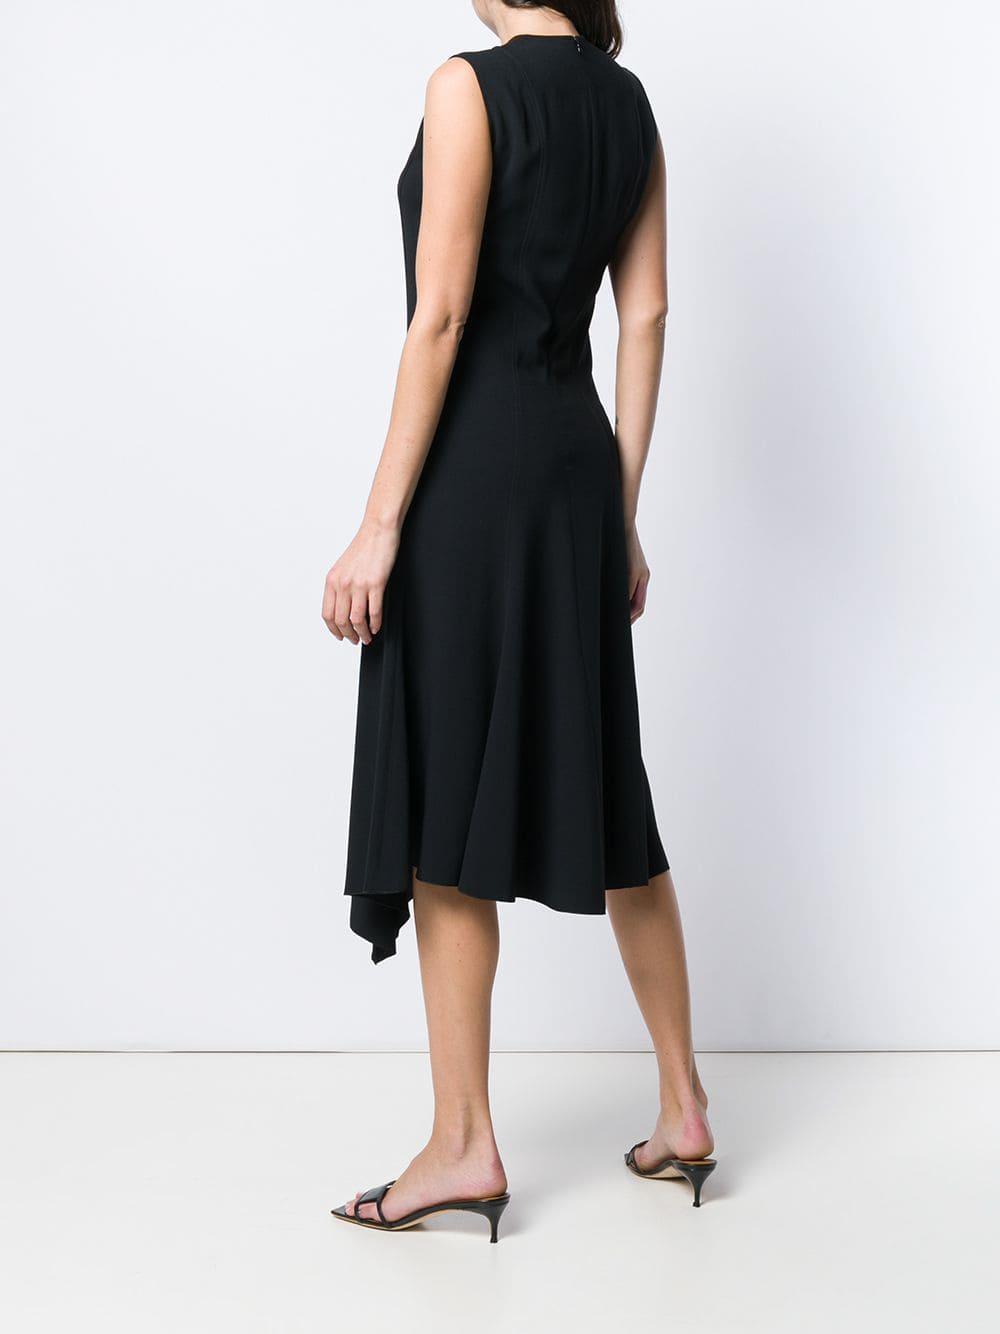 Picture of Joseph | Meline Dress